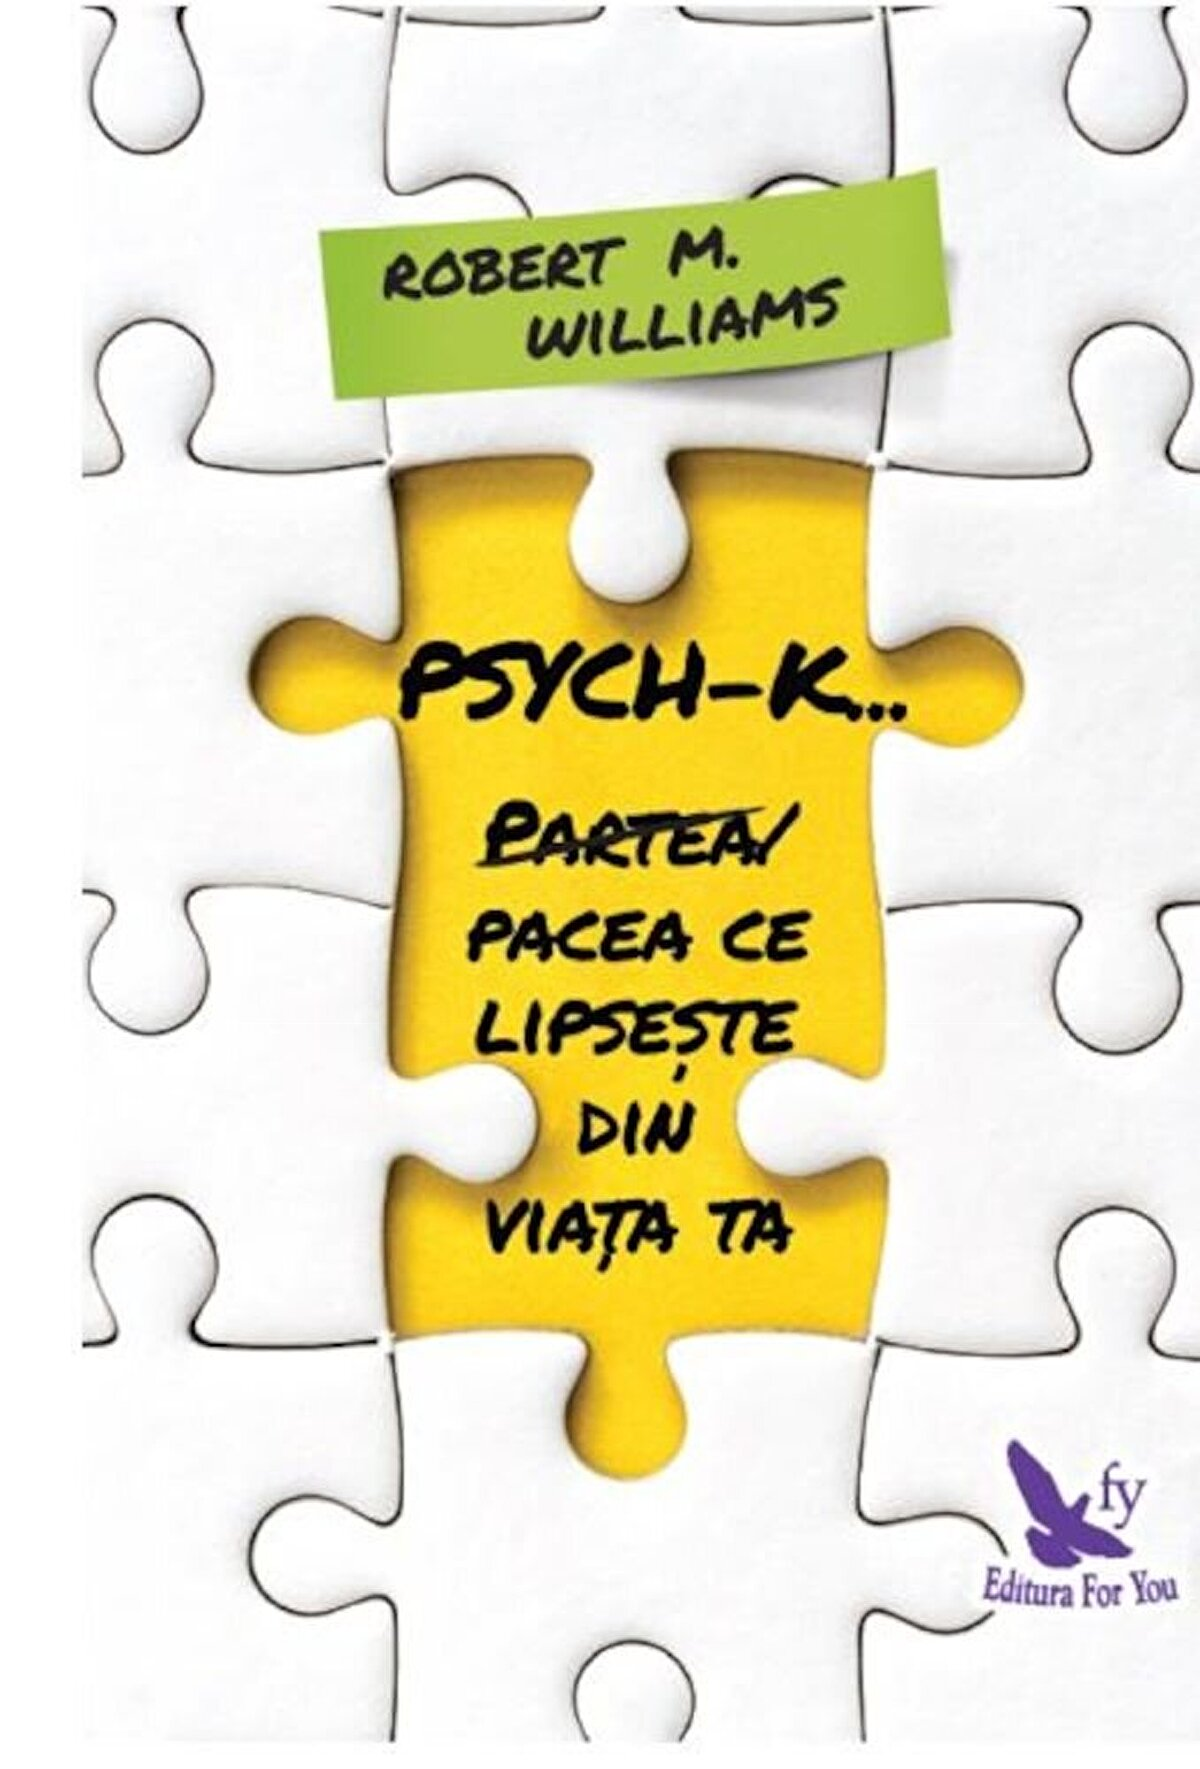 Psych-k. Partea/pacea ce lipseste din viata ta!